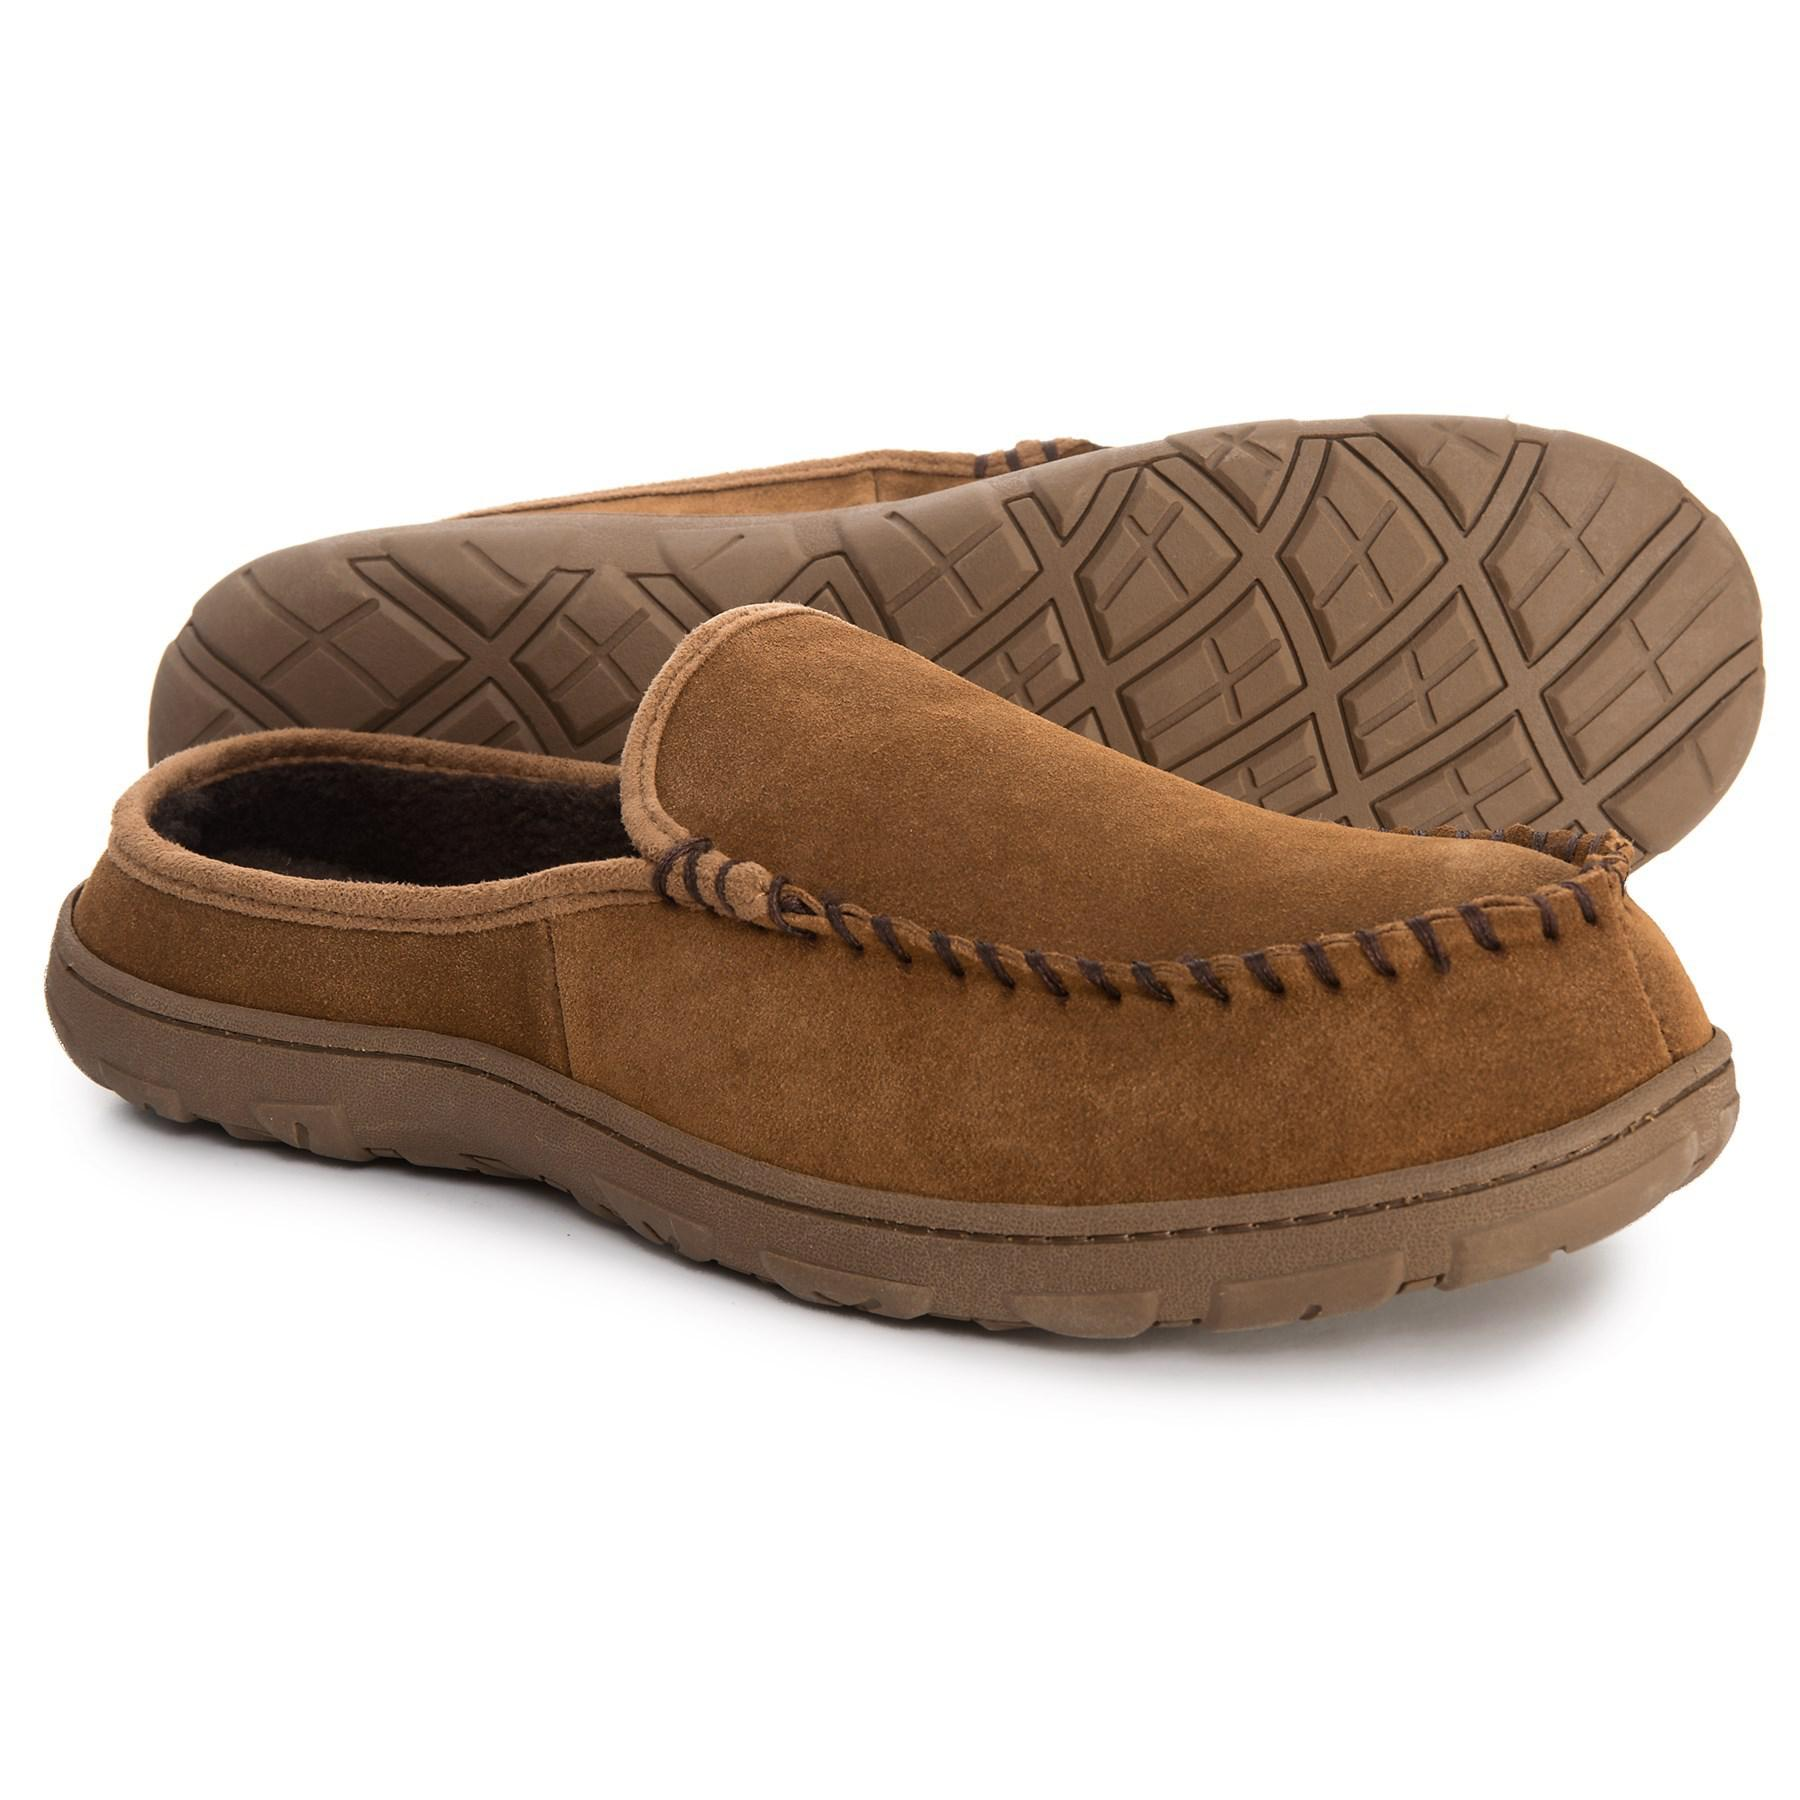 Rockport Genuine Suede Clog Slippers